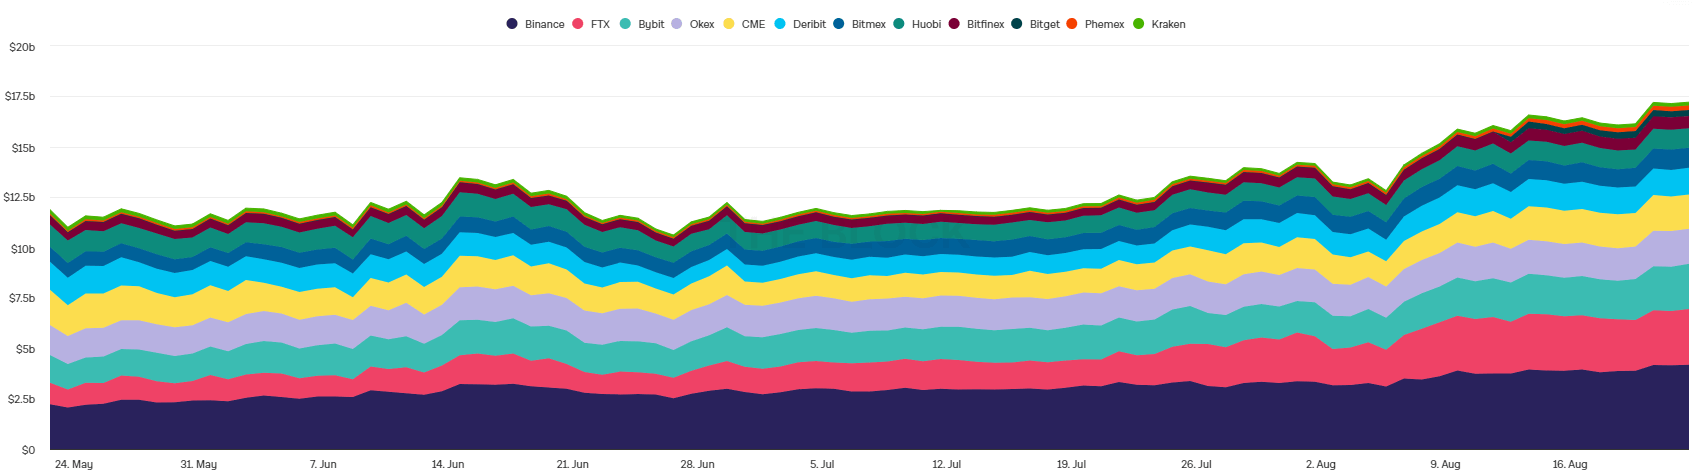 график трейдинг Биткоин блокчейн